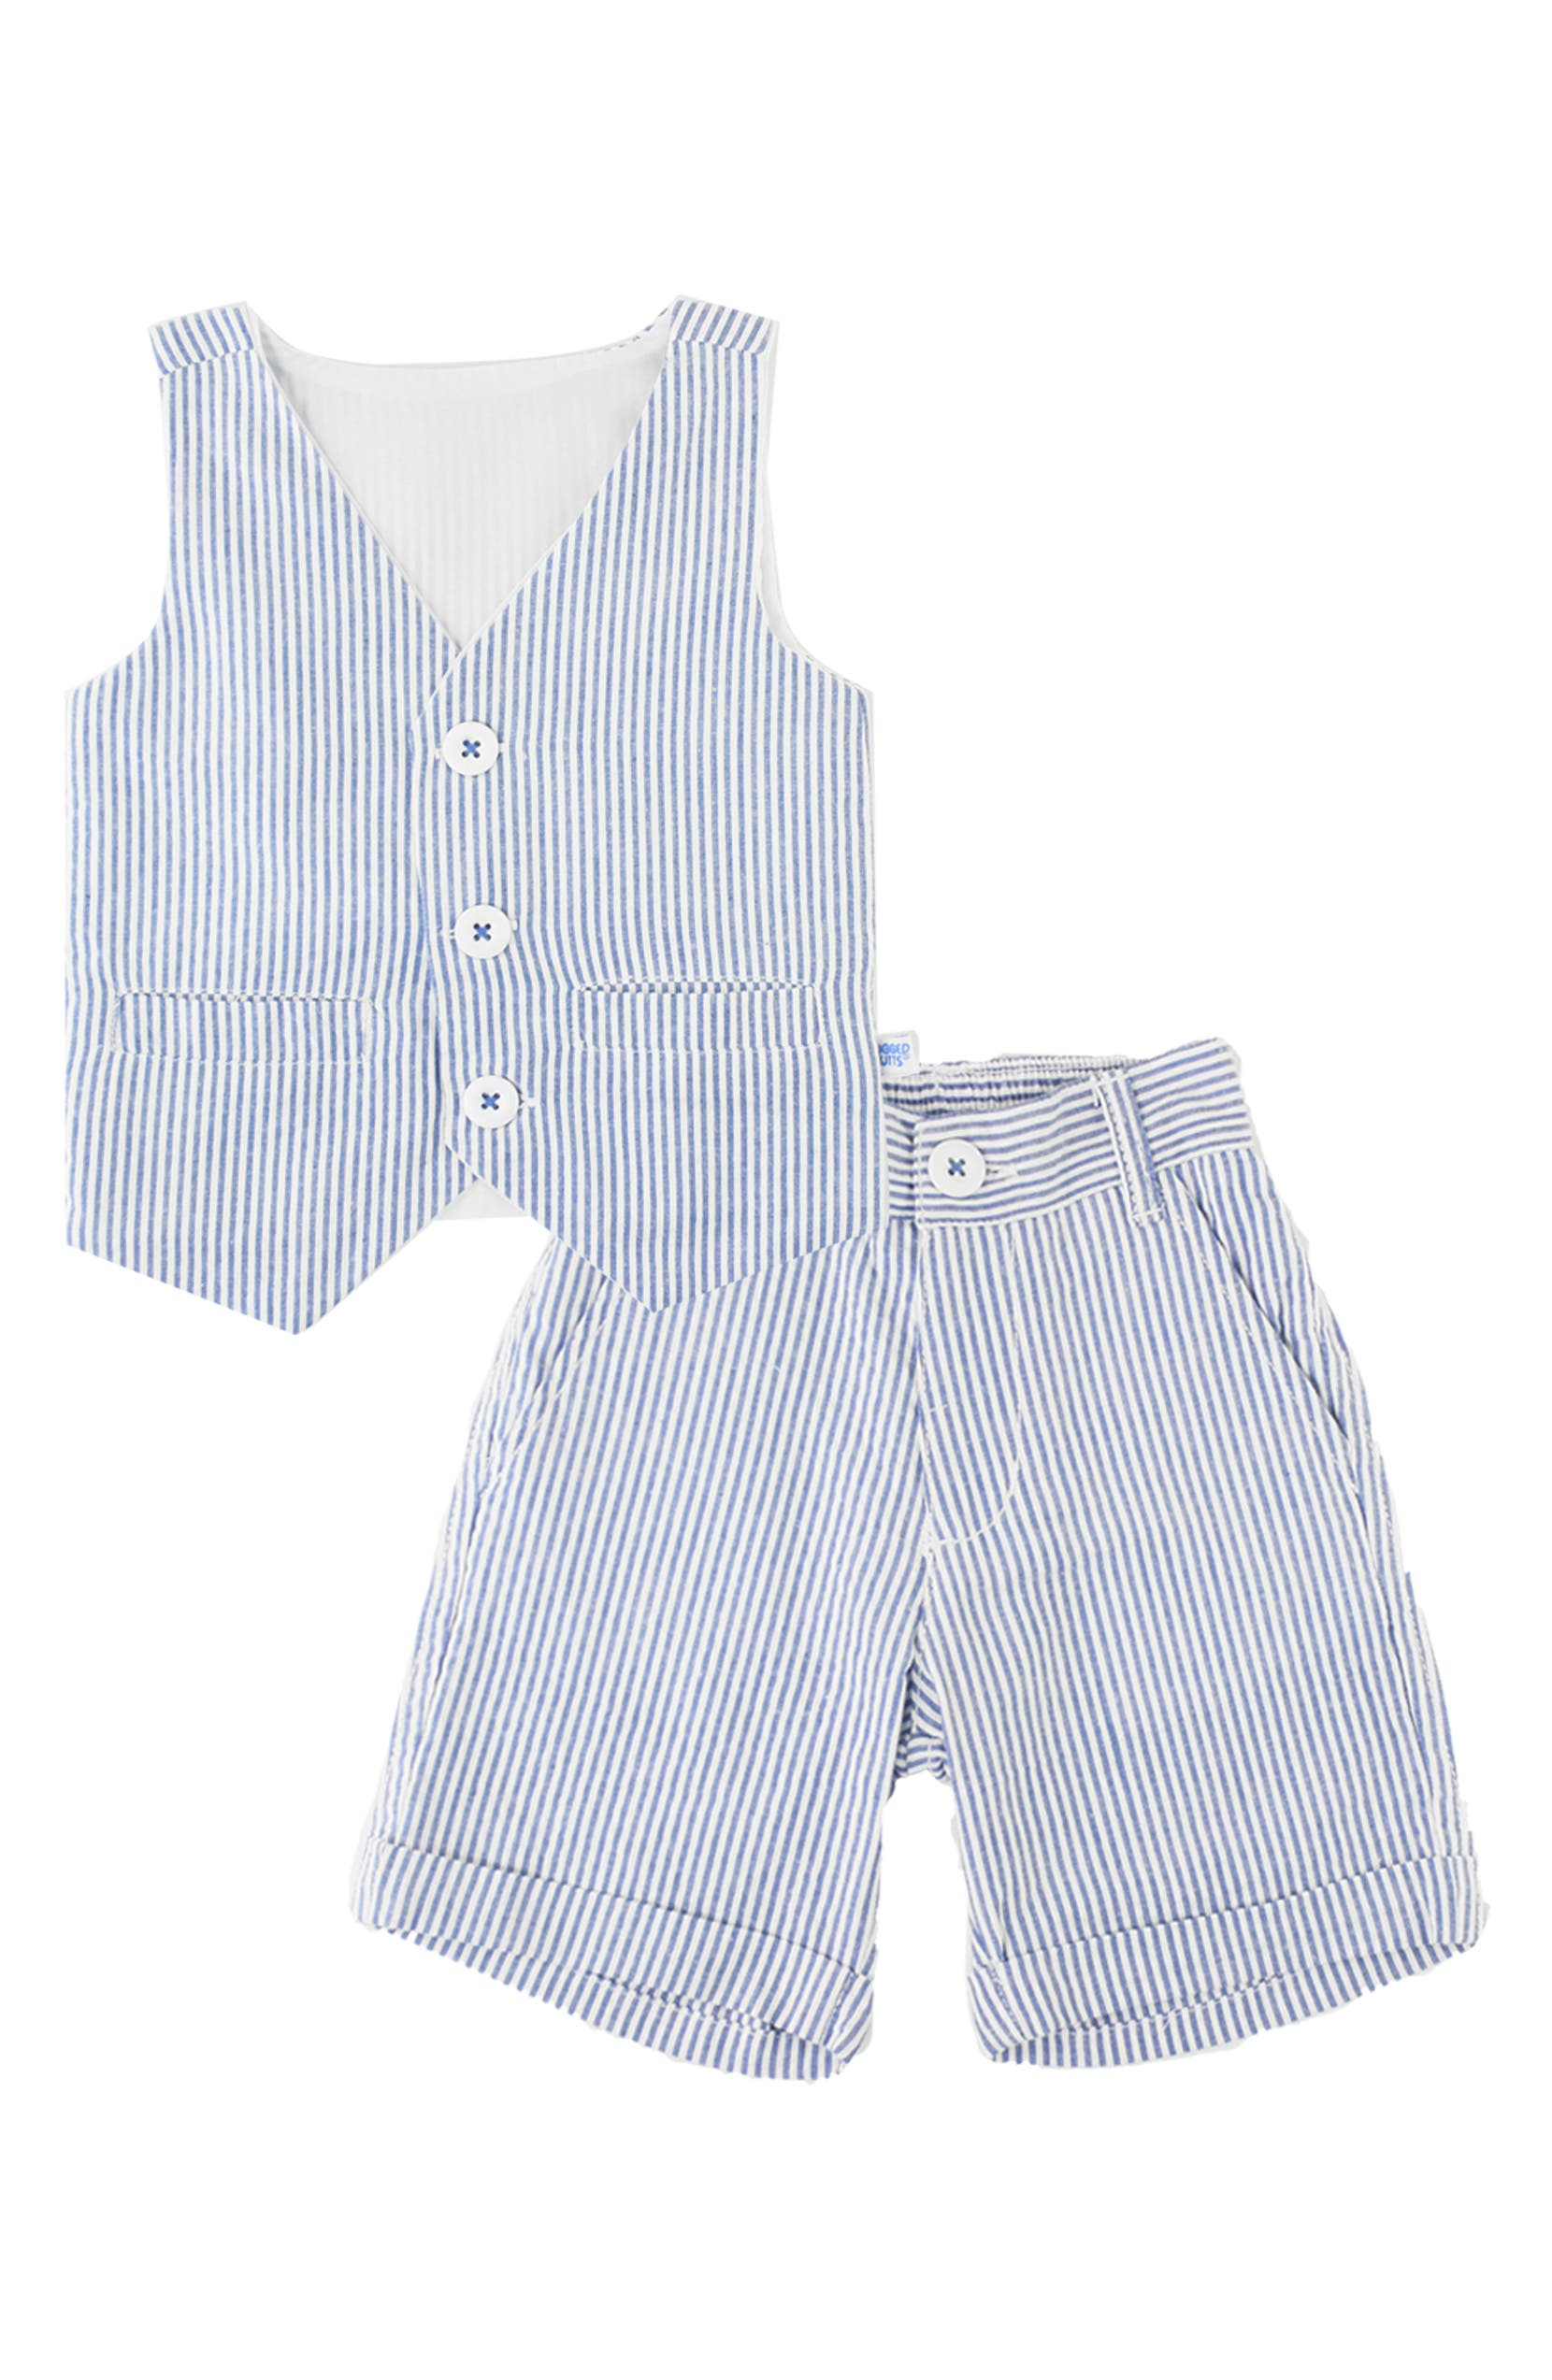 d294c5019a5f RuggedButts Seersucker Vest & Shorts Set (Baby Boys)   Nordstrom